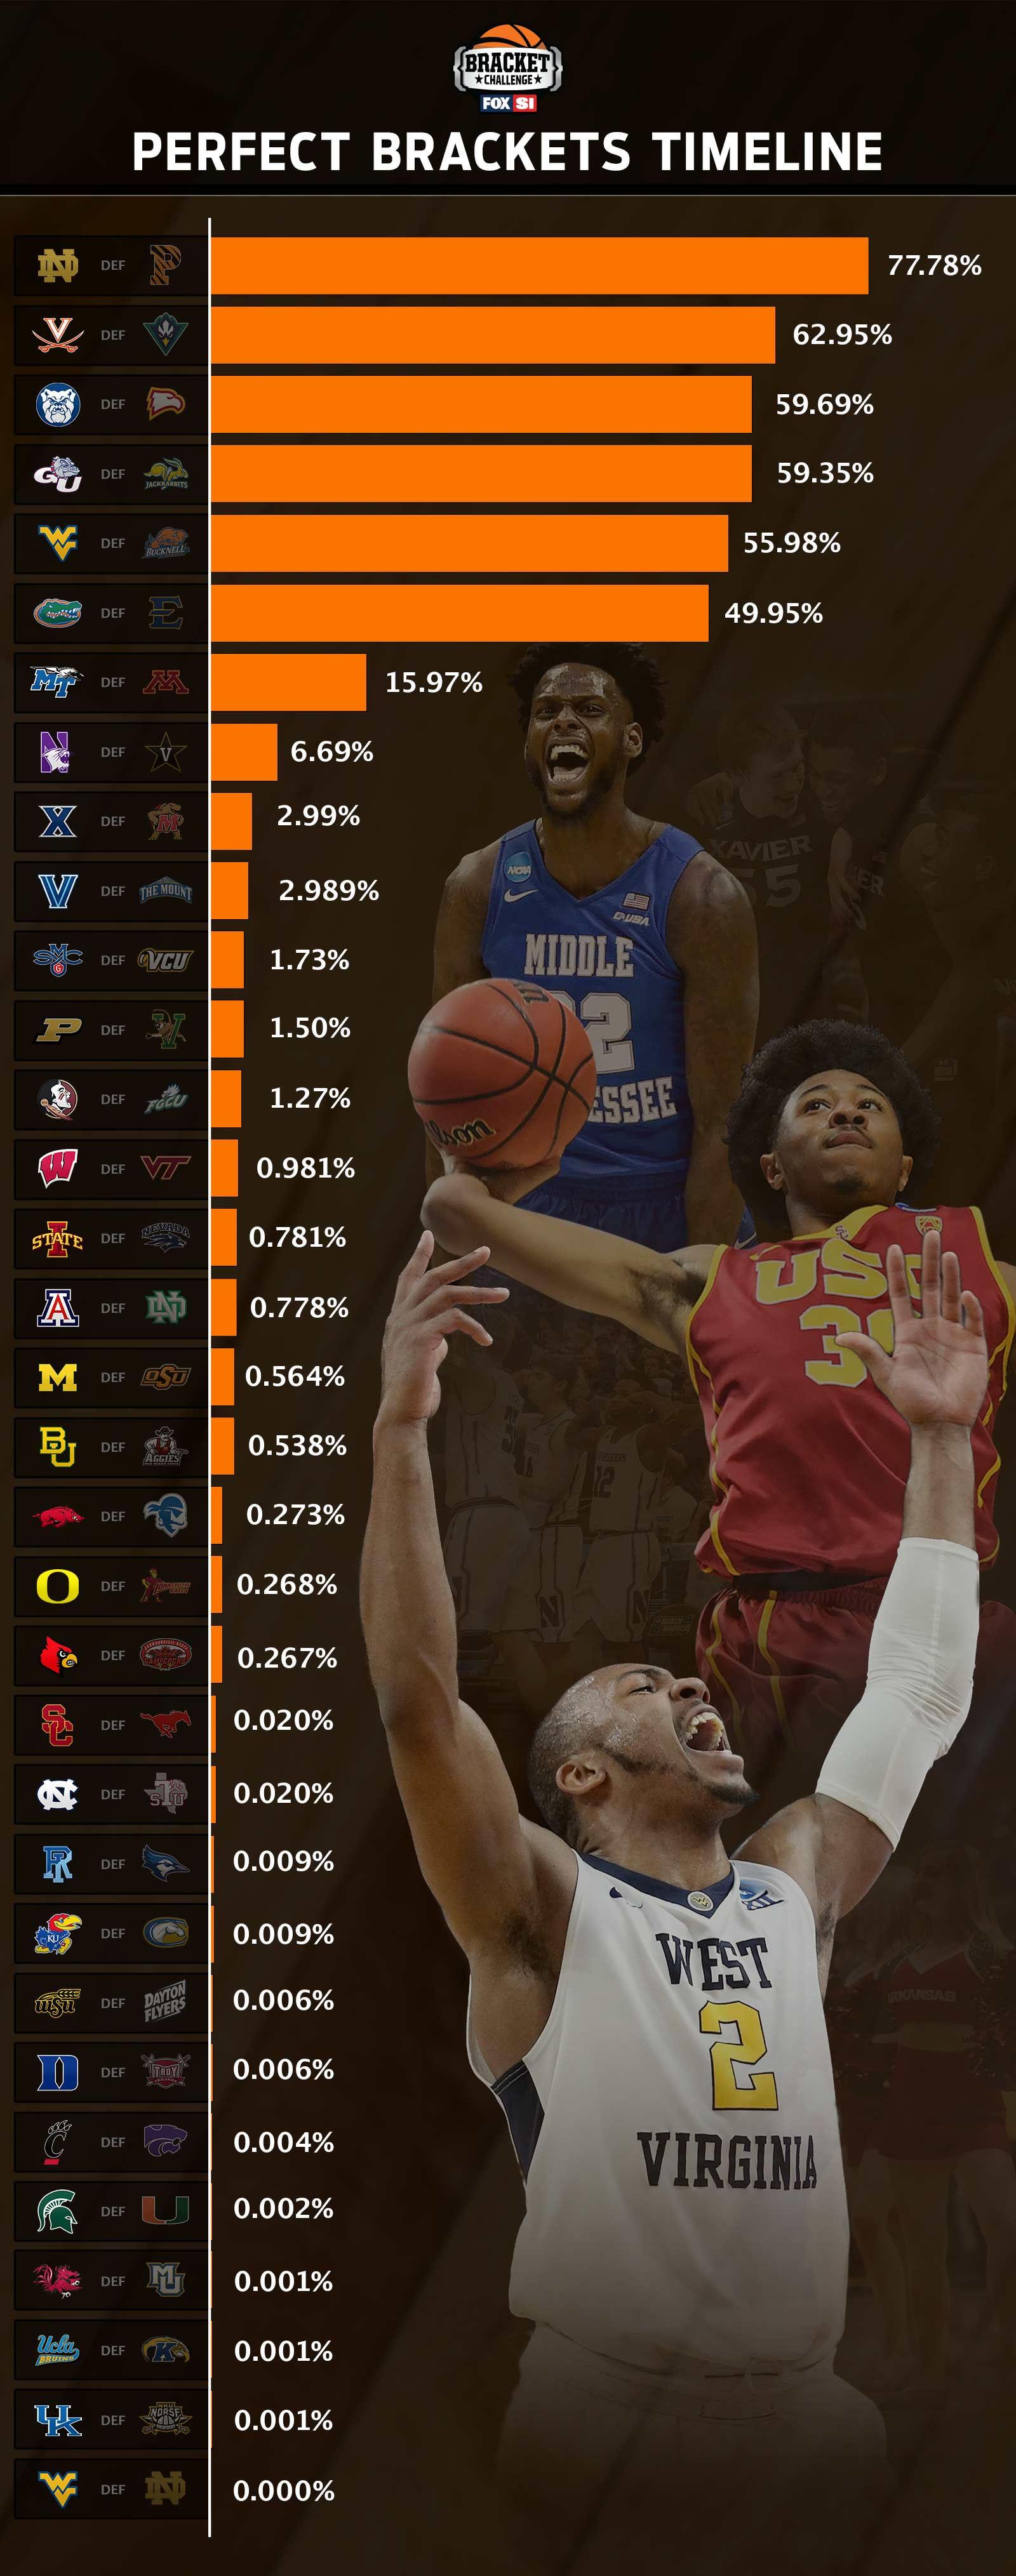 2017 NCAA Tournament Perfect Brackets Timeline